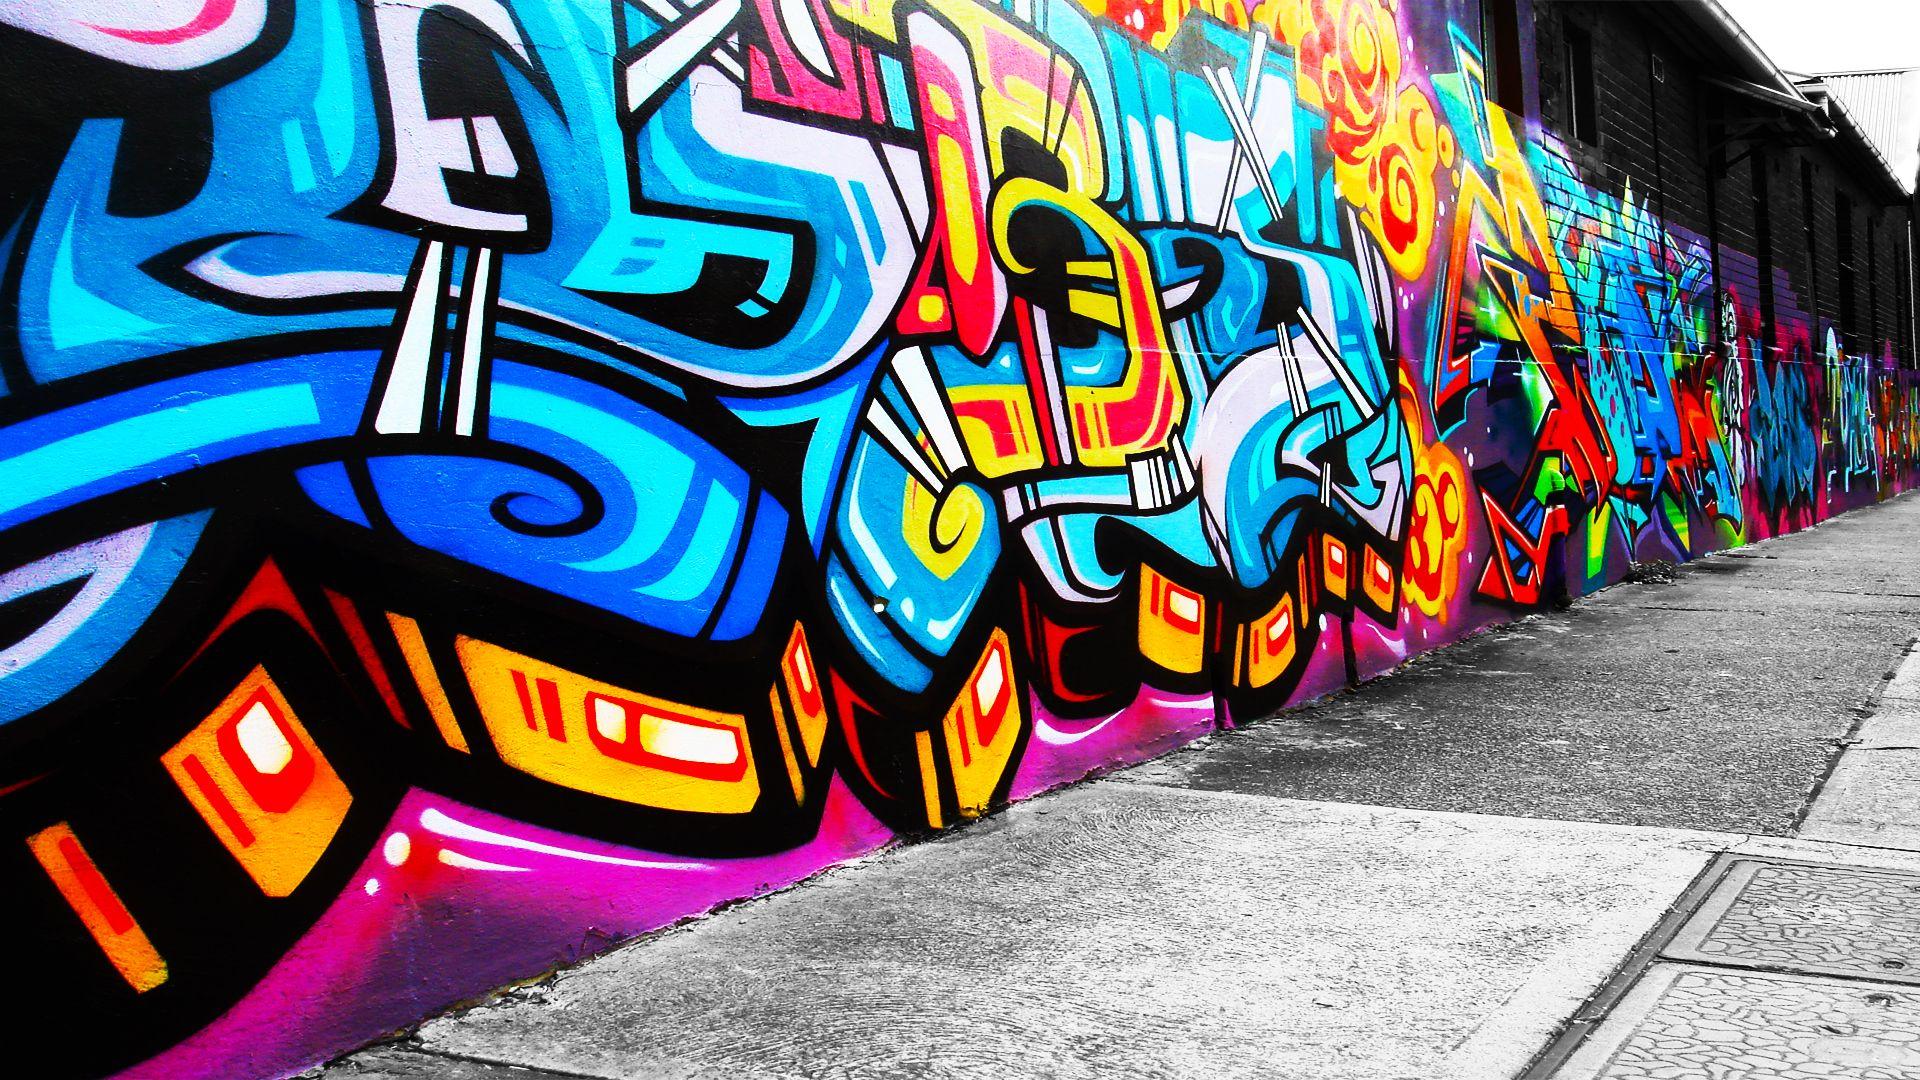 Cool Graffiti Art Wallpaper Free Download Search